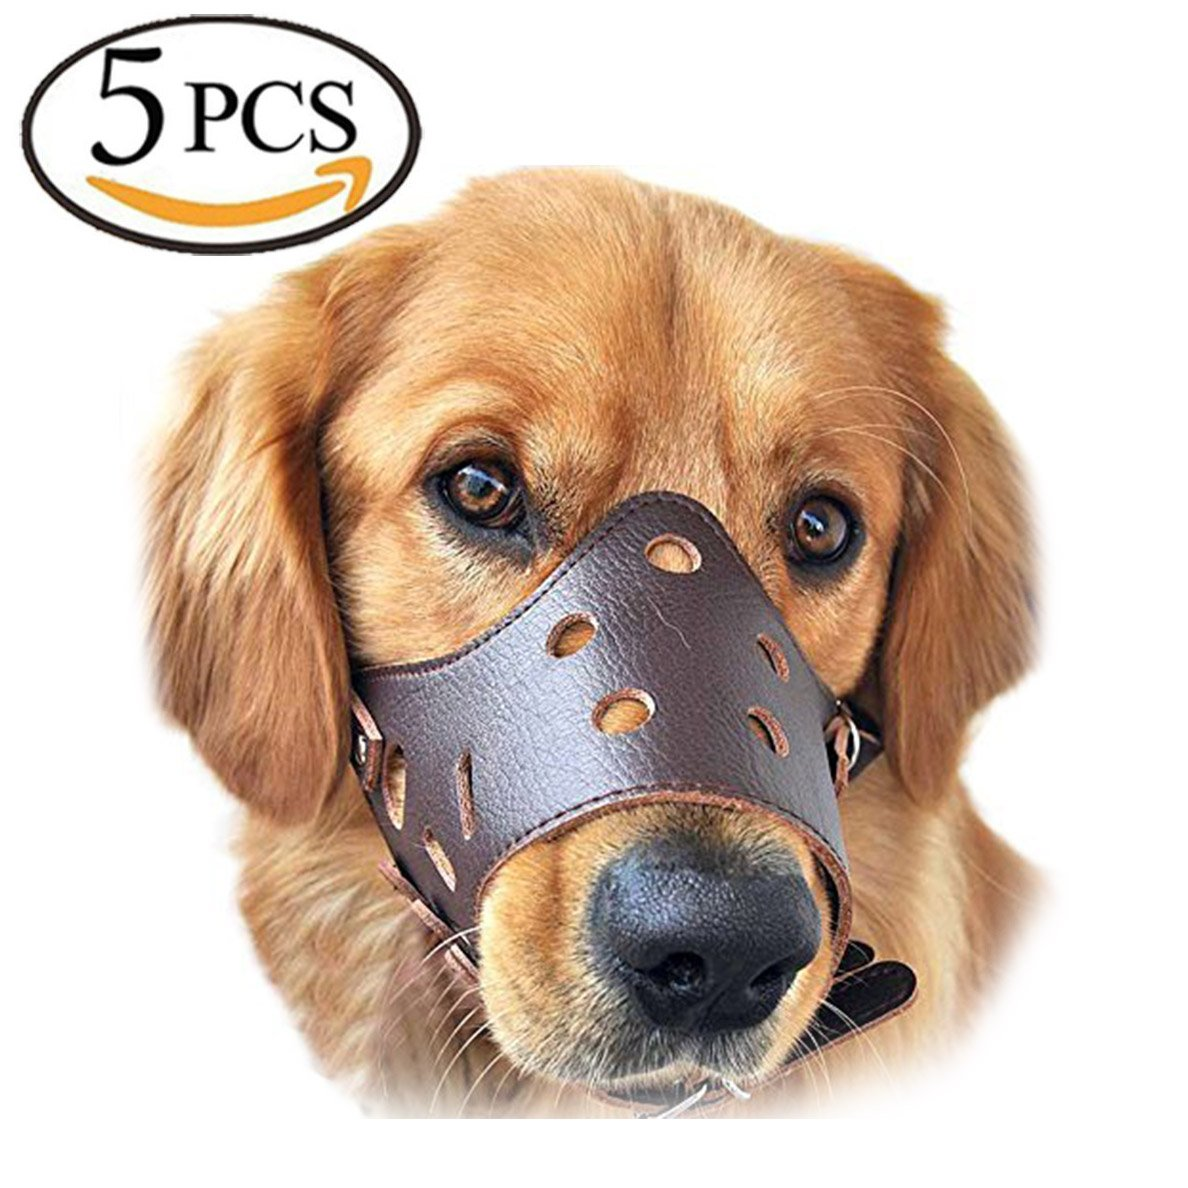 HS Dog muzzle, Muzzle for dog 5Pcs/Set in S,M,L,XL,XXL Adjustable Anti-biting Dog Muzzle Leather (Brown)